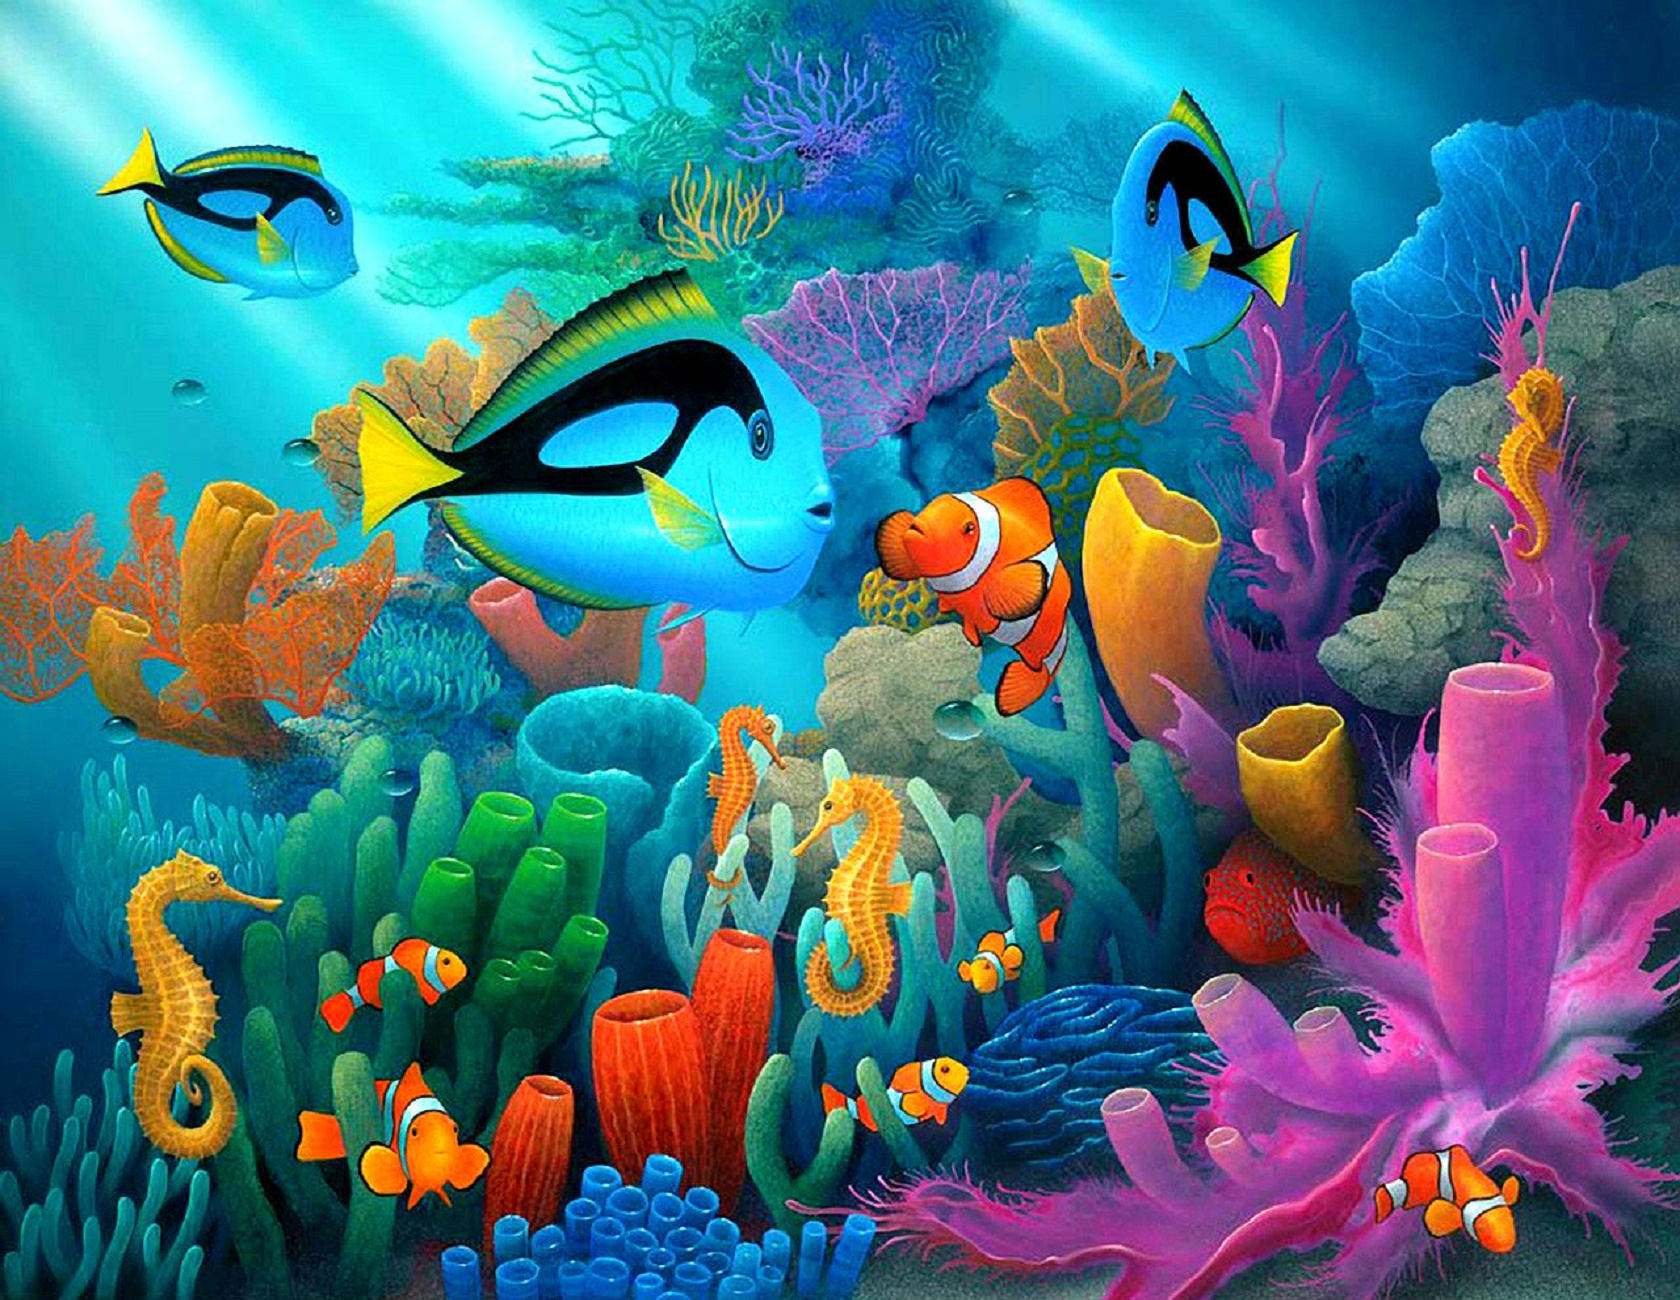 1680x1300 Underwater World Wallpapers HD Pictures u20acu201c